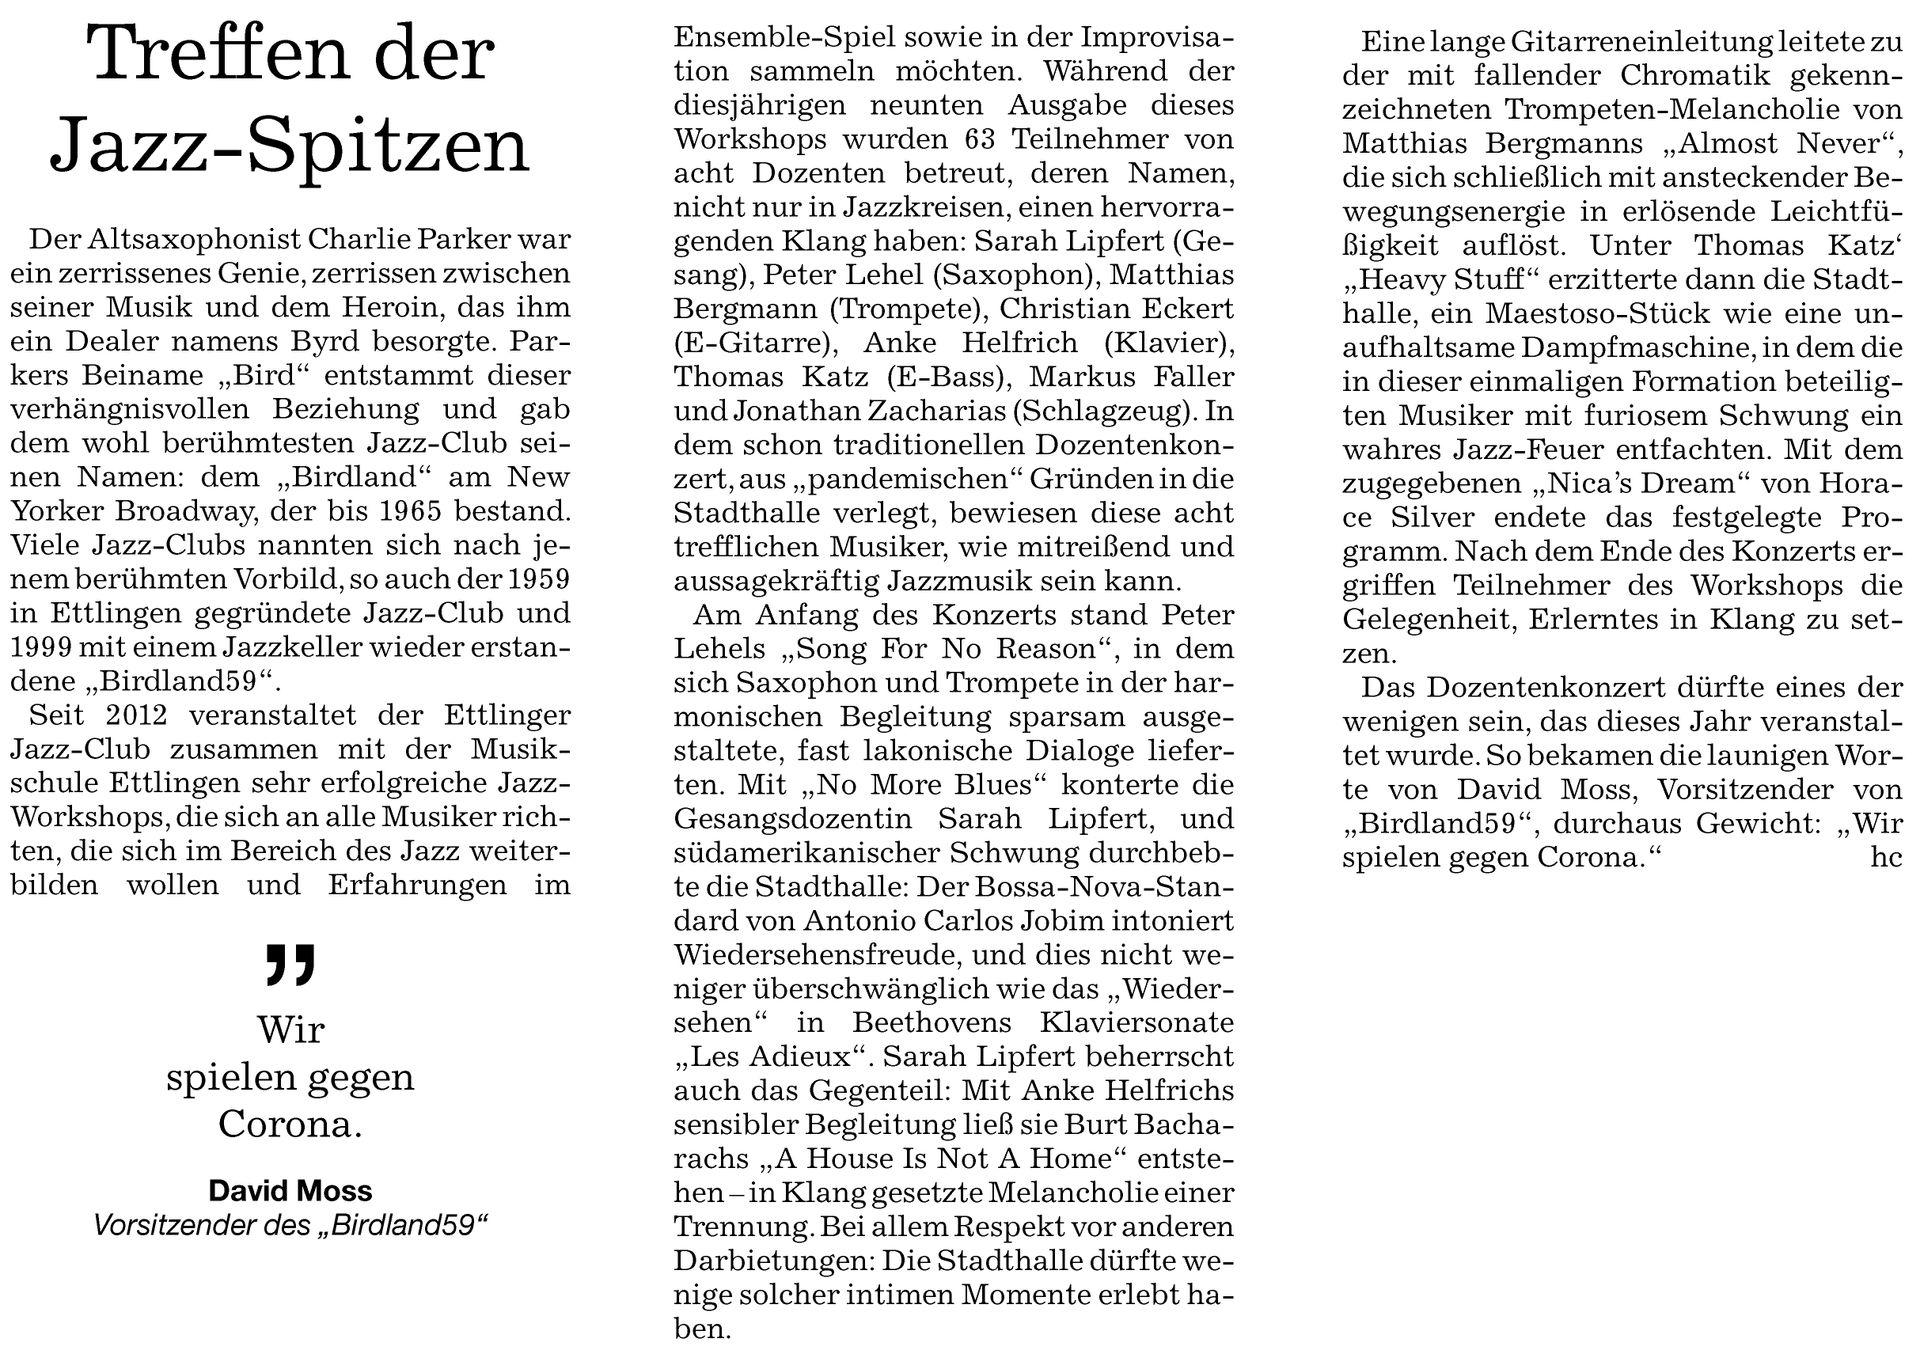 Presse   Jazz-Club Ettlingen